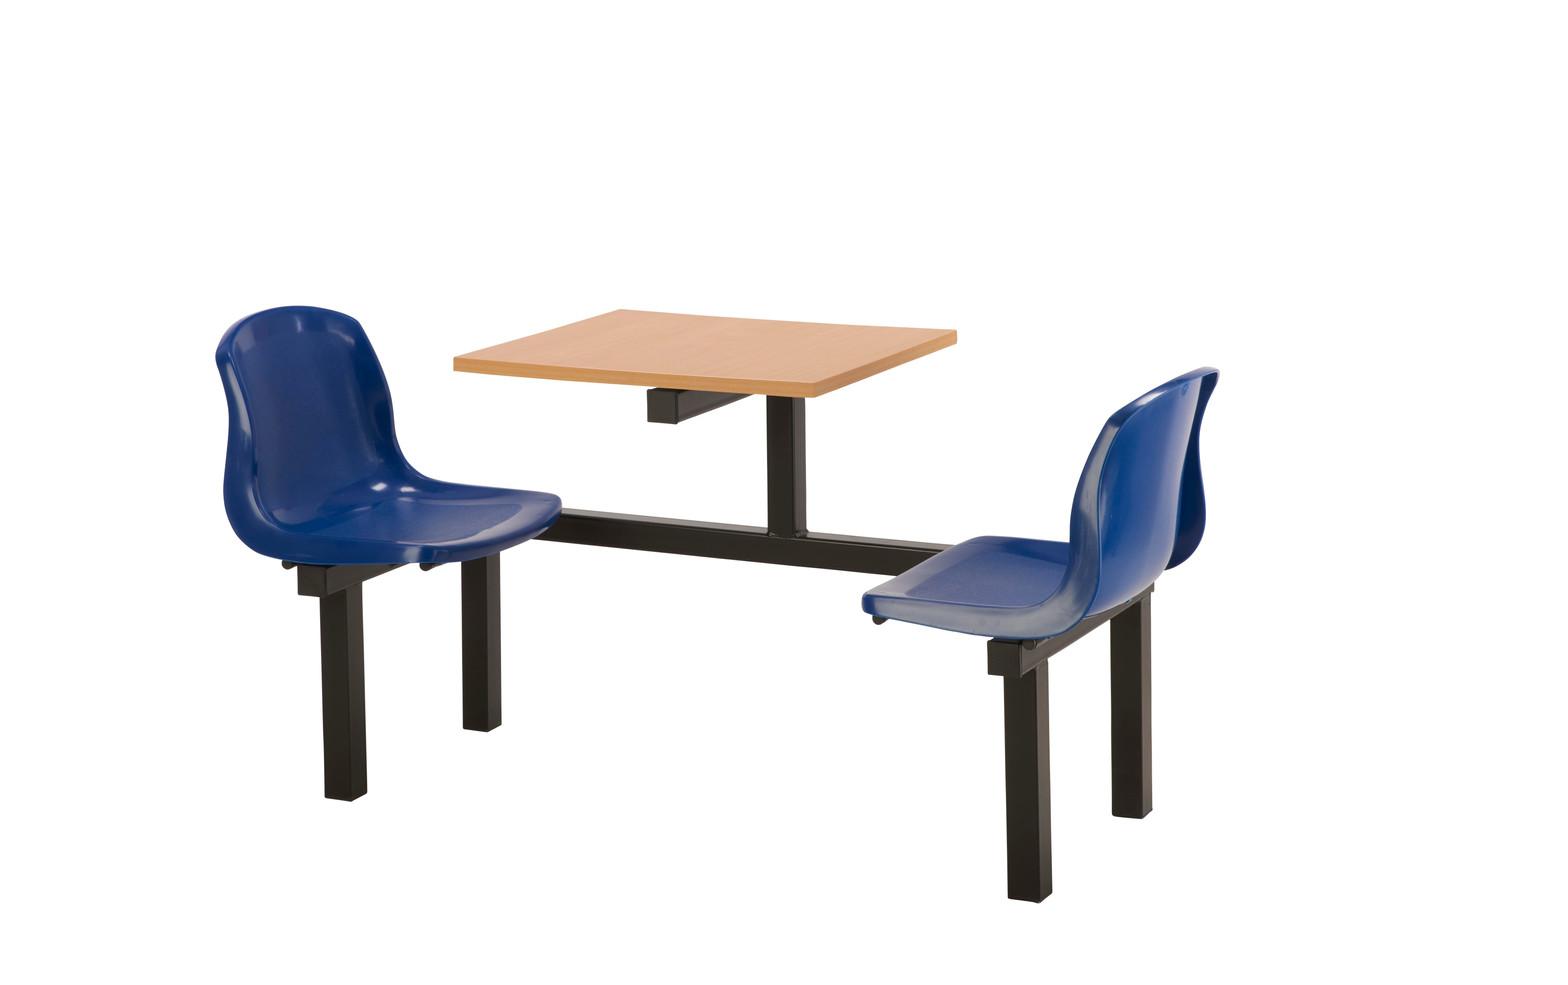 CU90-2SF-BLUE - BEECH